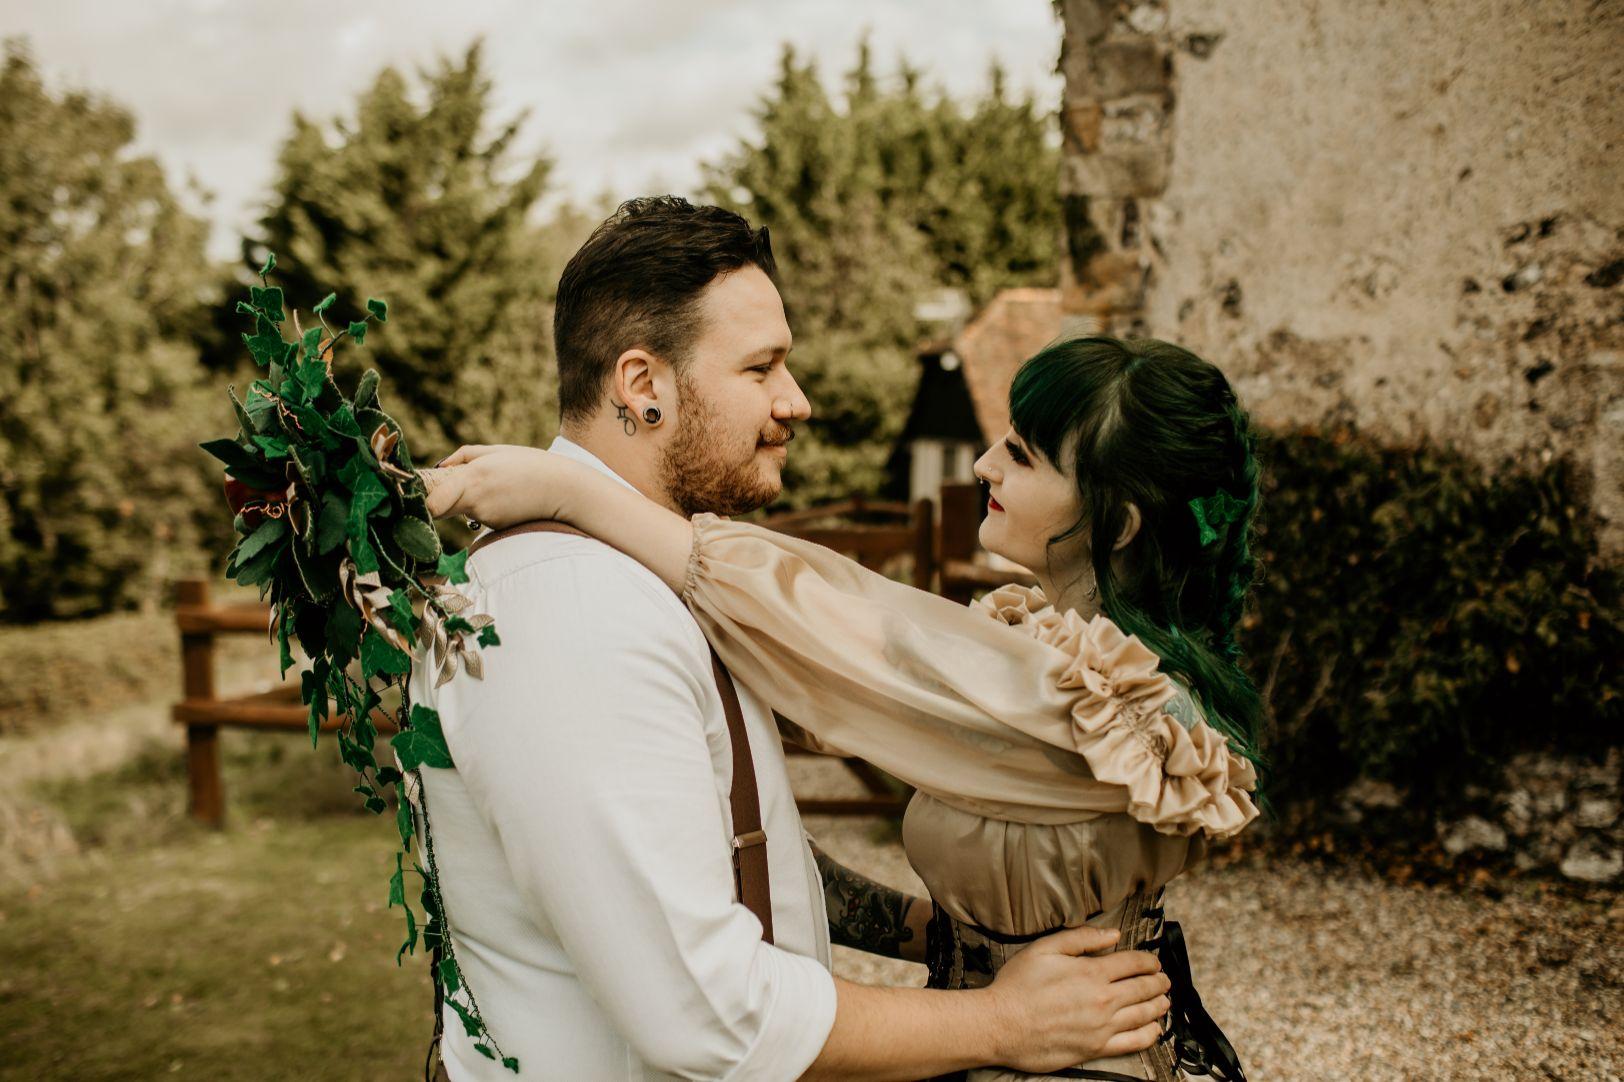 alternative fairytale wedding- snow white wedding- charlotte laurie designs-chloe mary photo- unconventional wedding- alternative wedding inspiration- alternative couple wedding